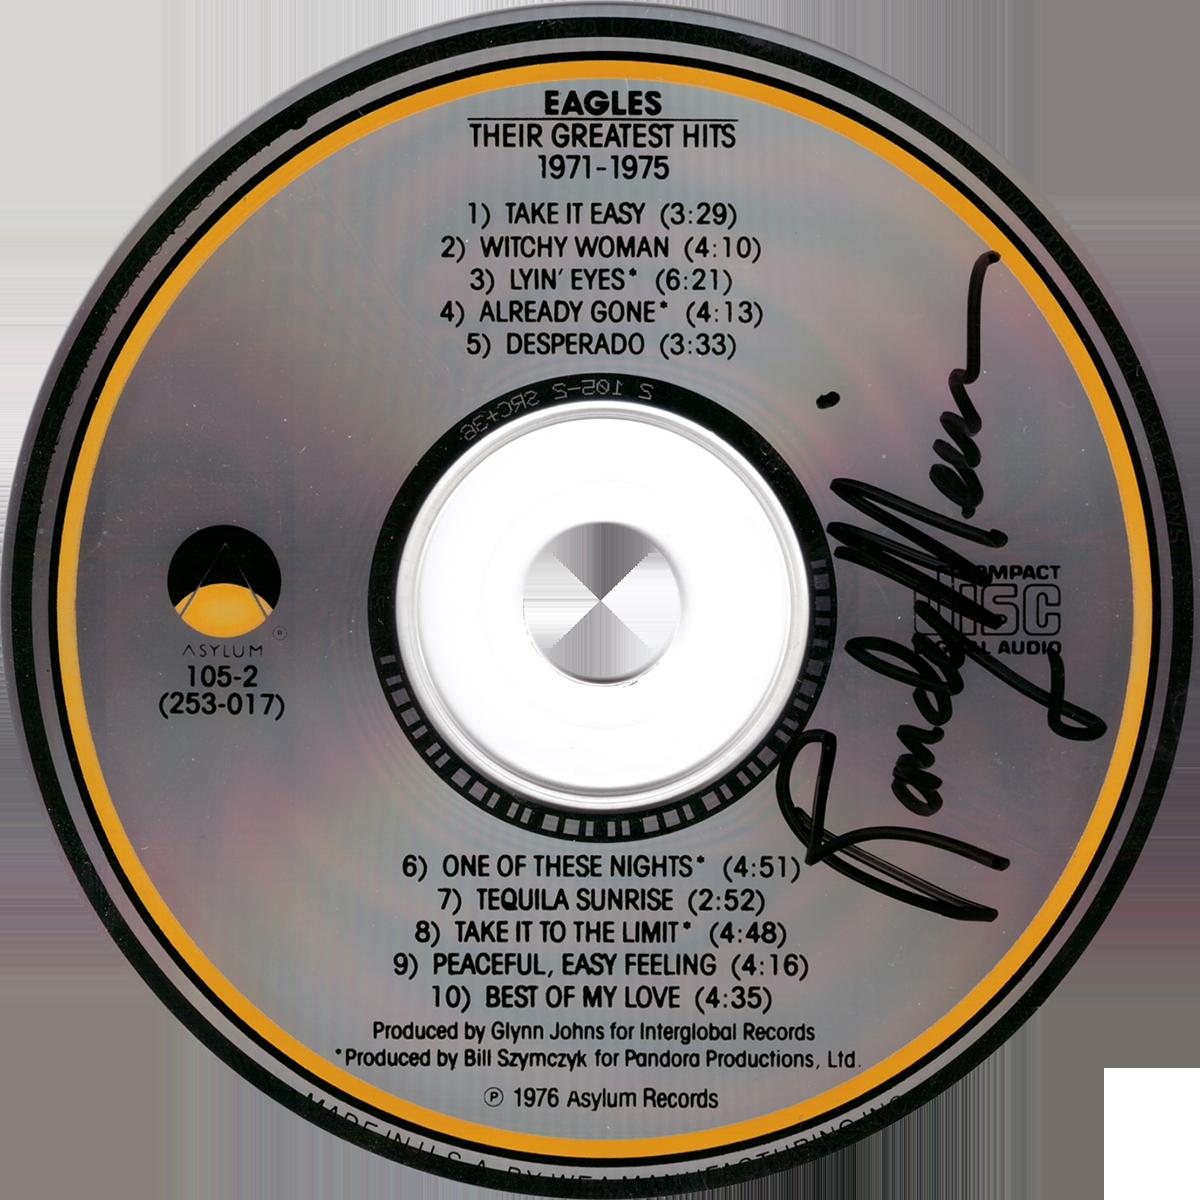 Randy Meisner CD - Eagles: Their Greateset Hits 1971-1975